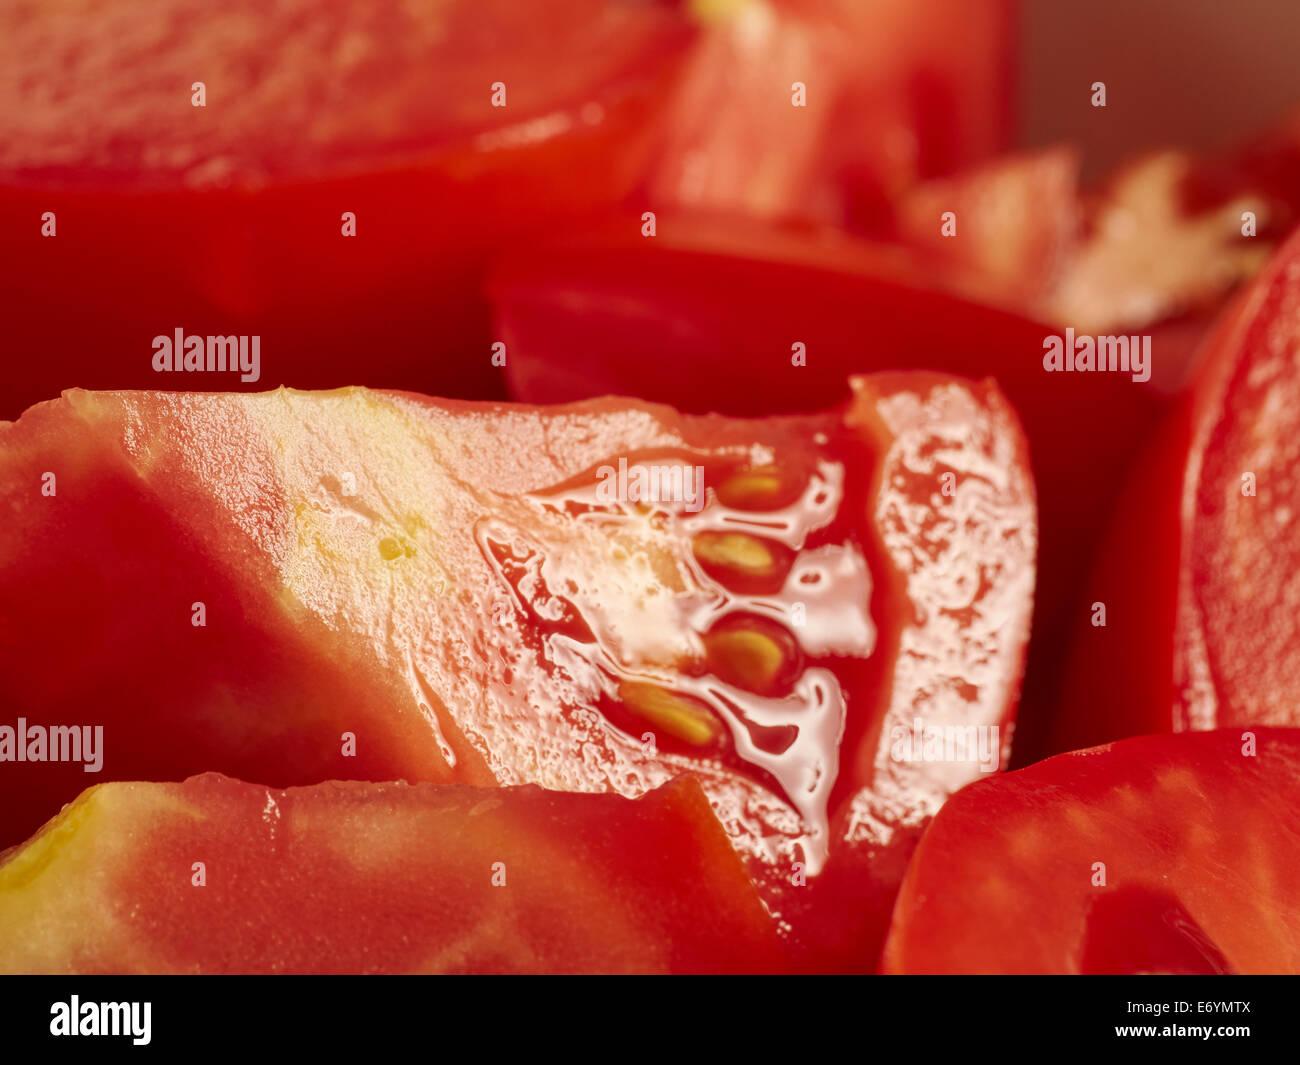 Wedges of ripe tomato - Stock Image